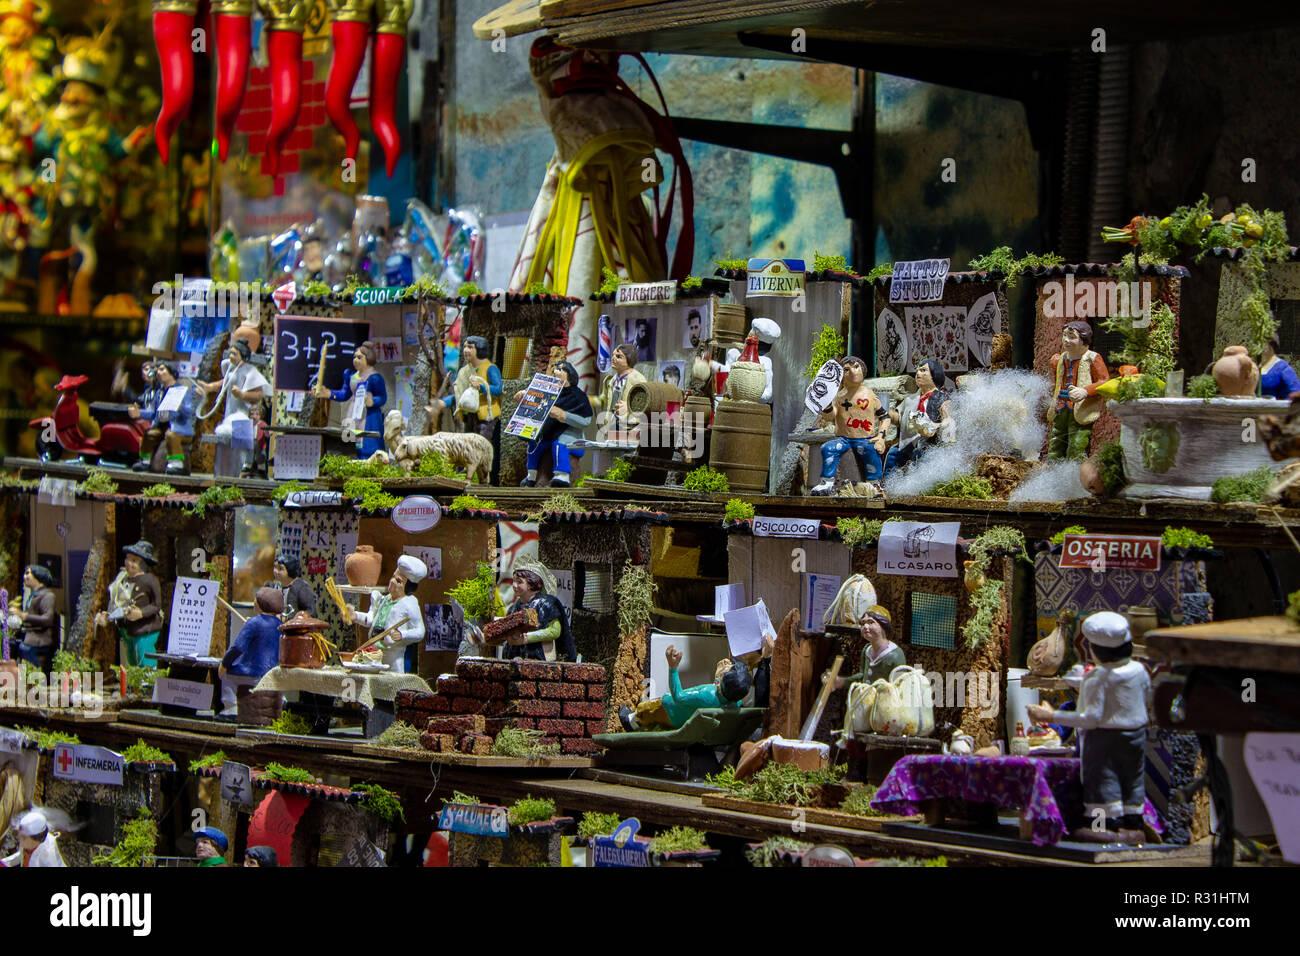 Naples, San Gregorio Armeno the professions represented in the neapolitan crib. 03/11/2018 - Stock Image